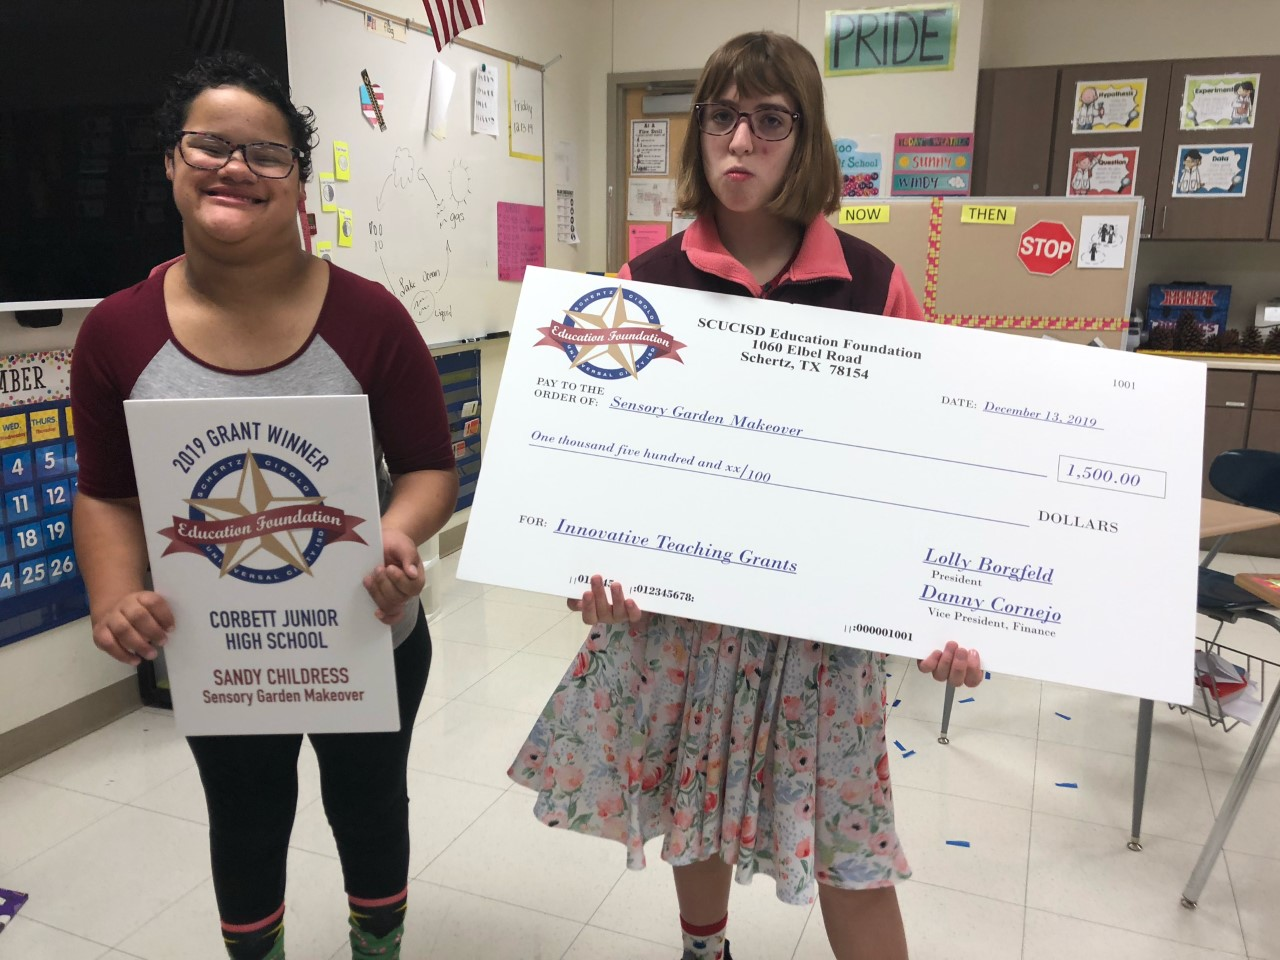 Students receive grant money to improve current Sensory Garden.